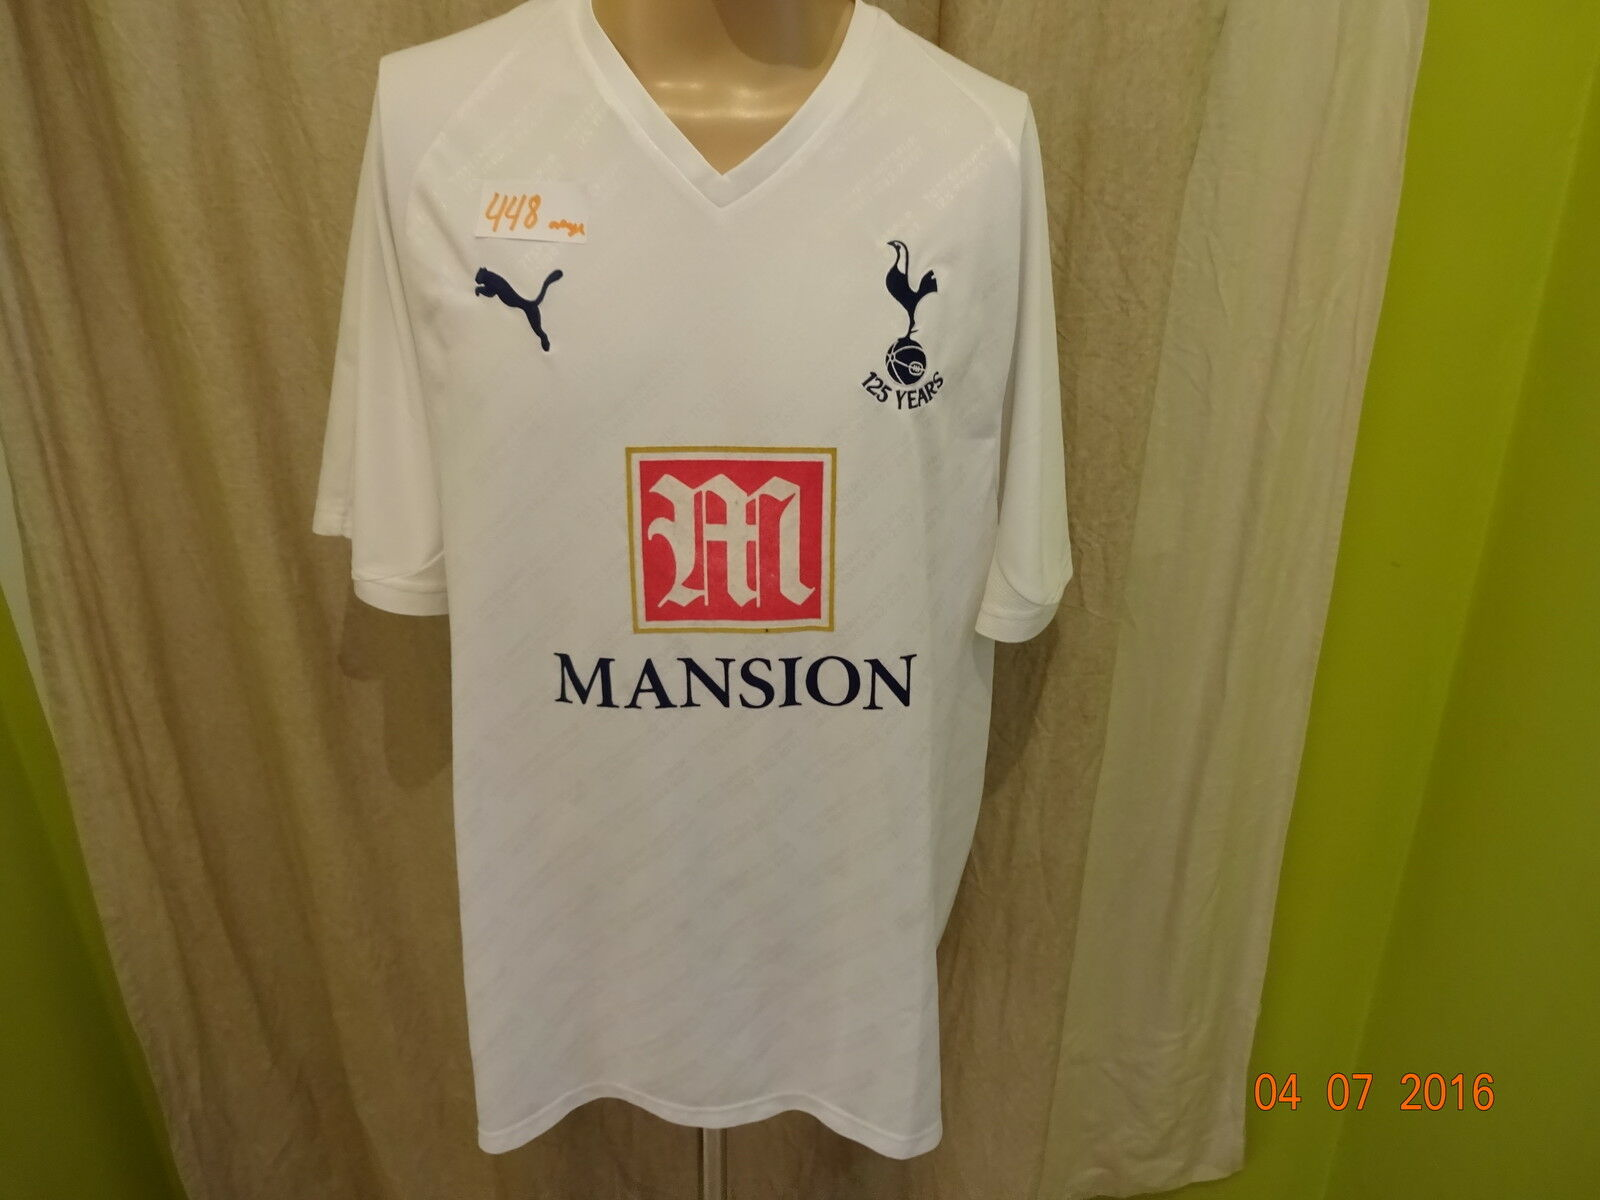 Tottenham Hotspurs Original Puma 125 Jahre Jubiläum Trikot 2007    MANSION  Gr.XXL 594bc7